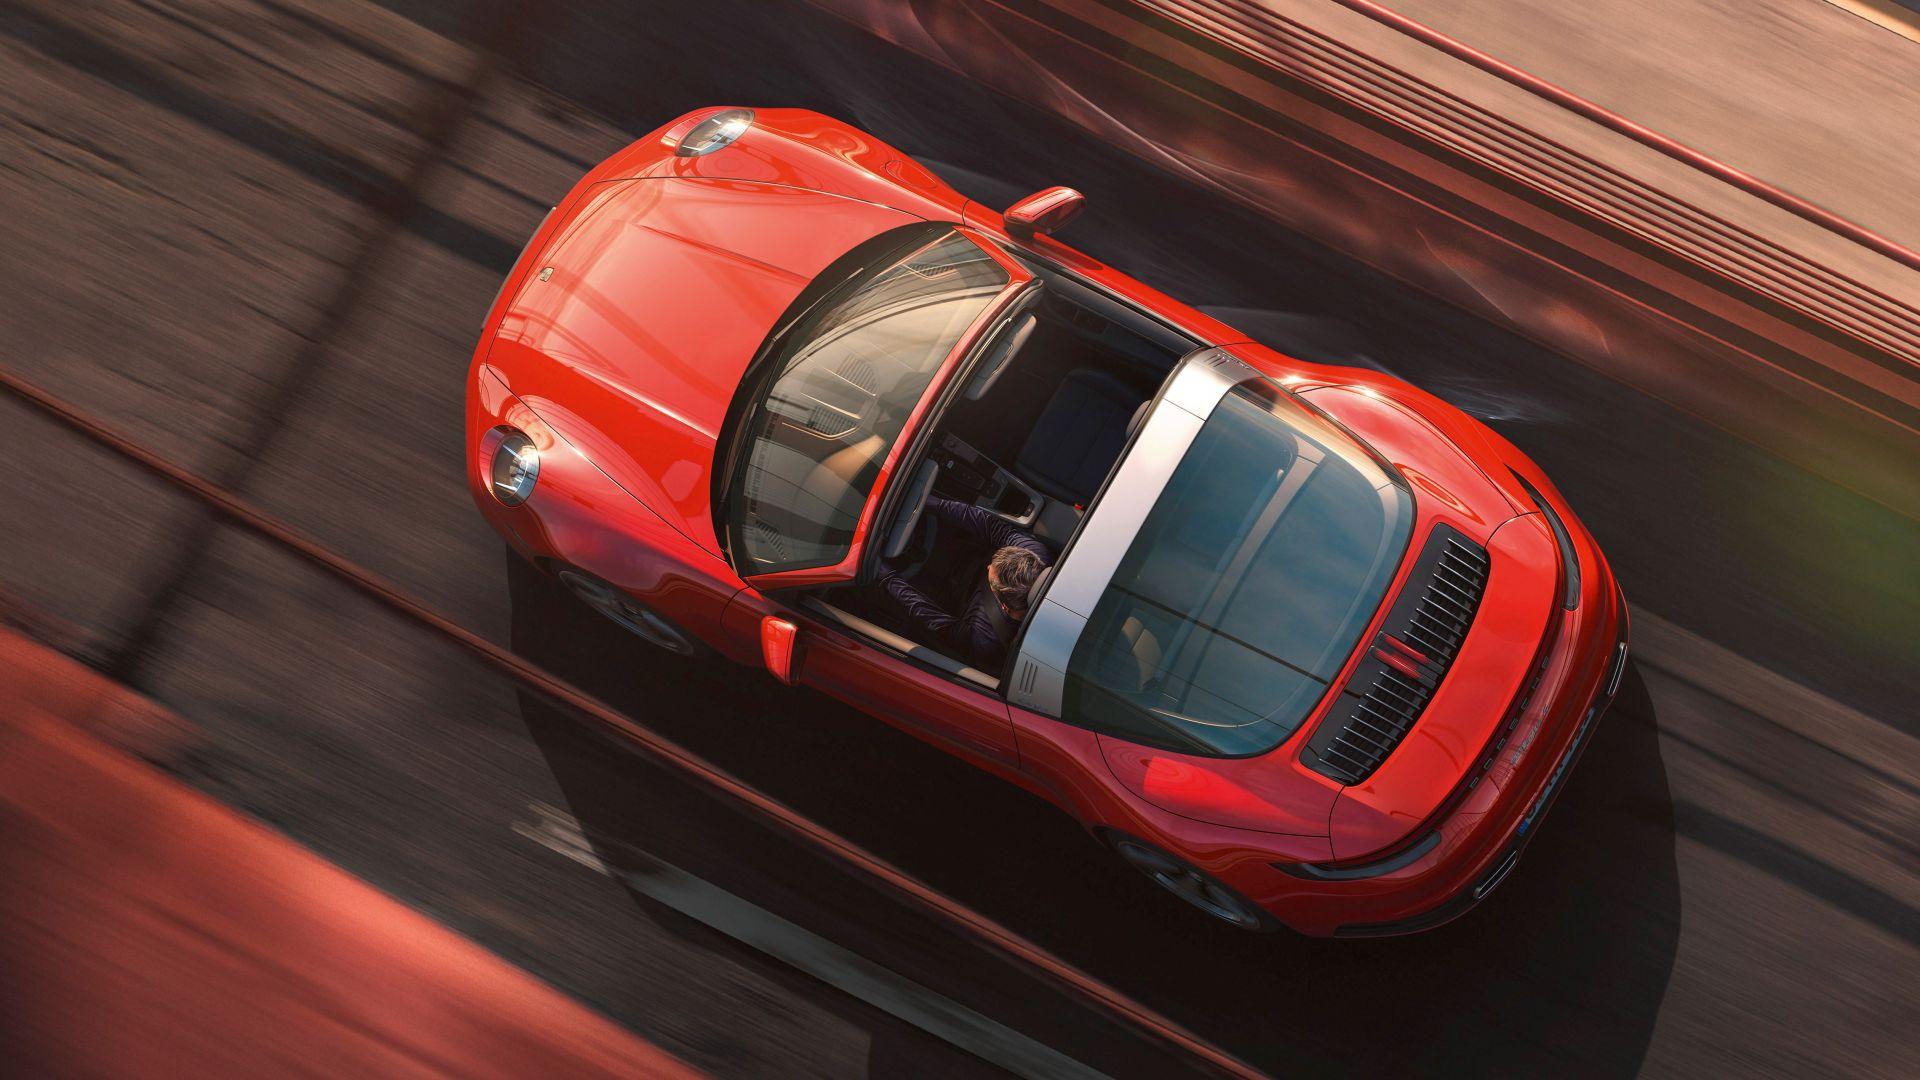 Predstavljena je nova generacija modela Porsche 911 Targa 4 i 911 Targa 4S